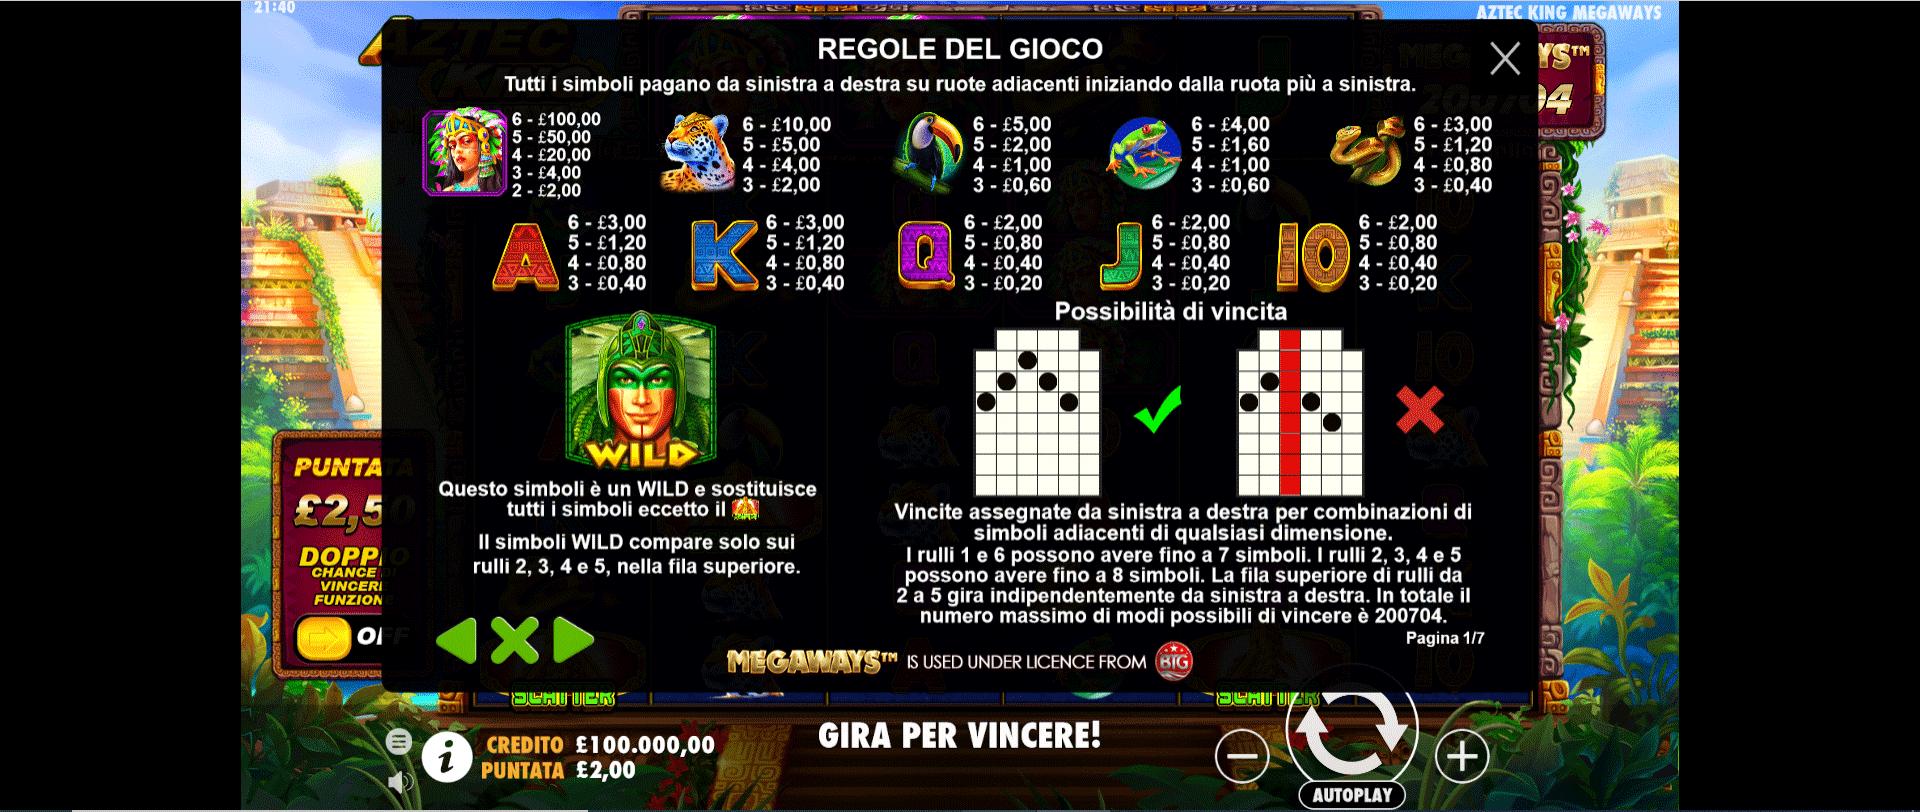 tabella dei simboli della slot online aztec king megaways